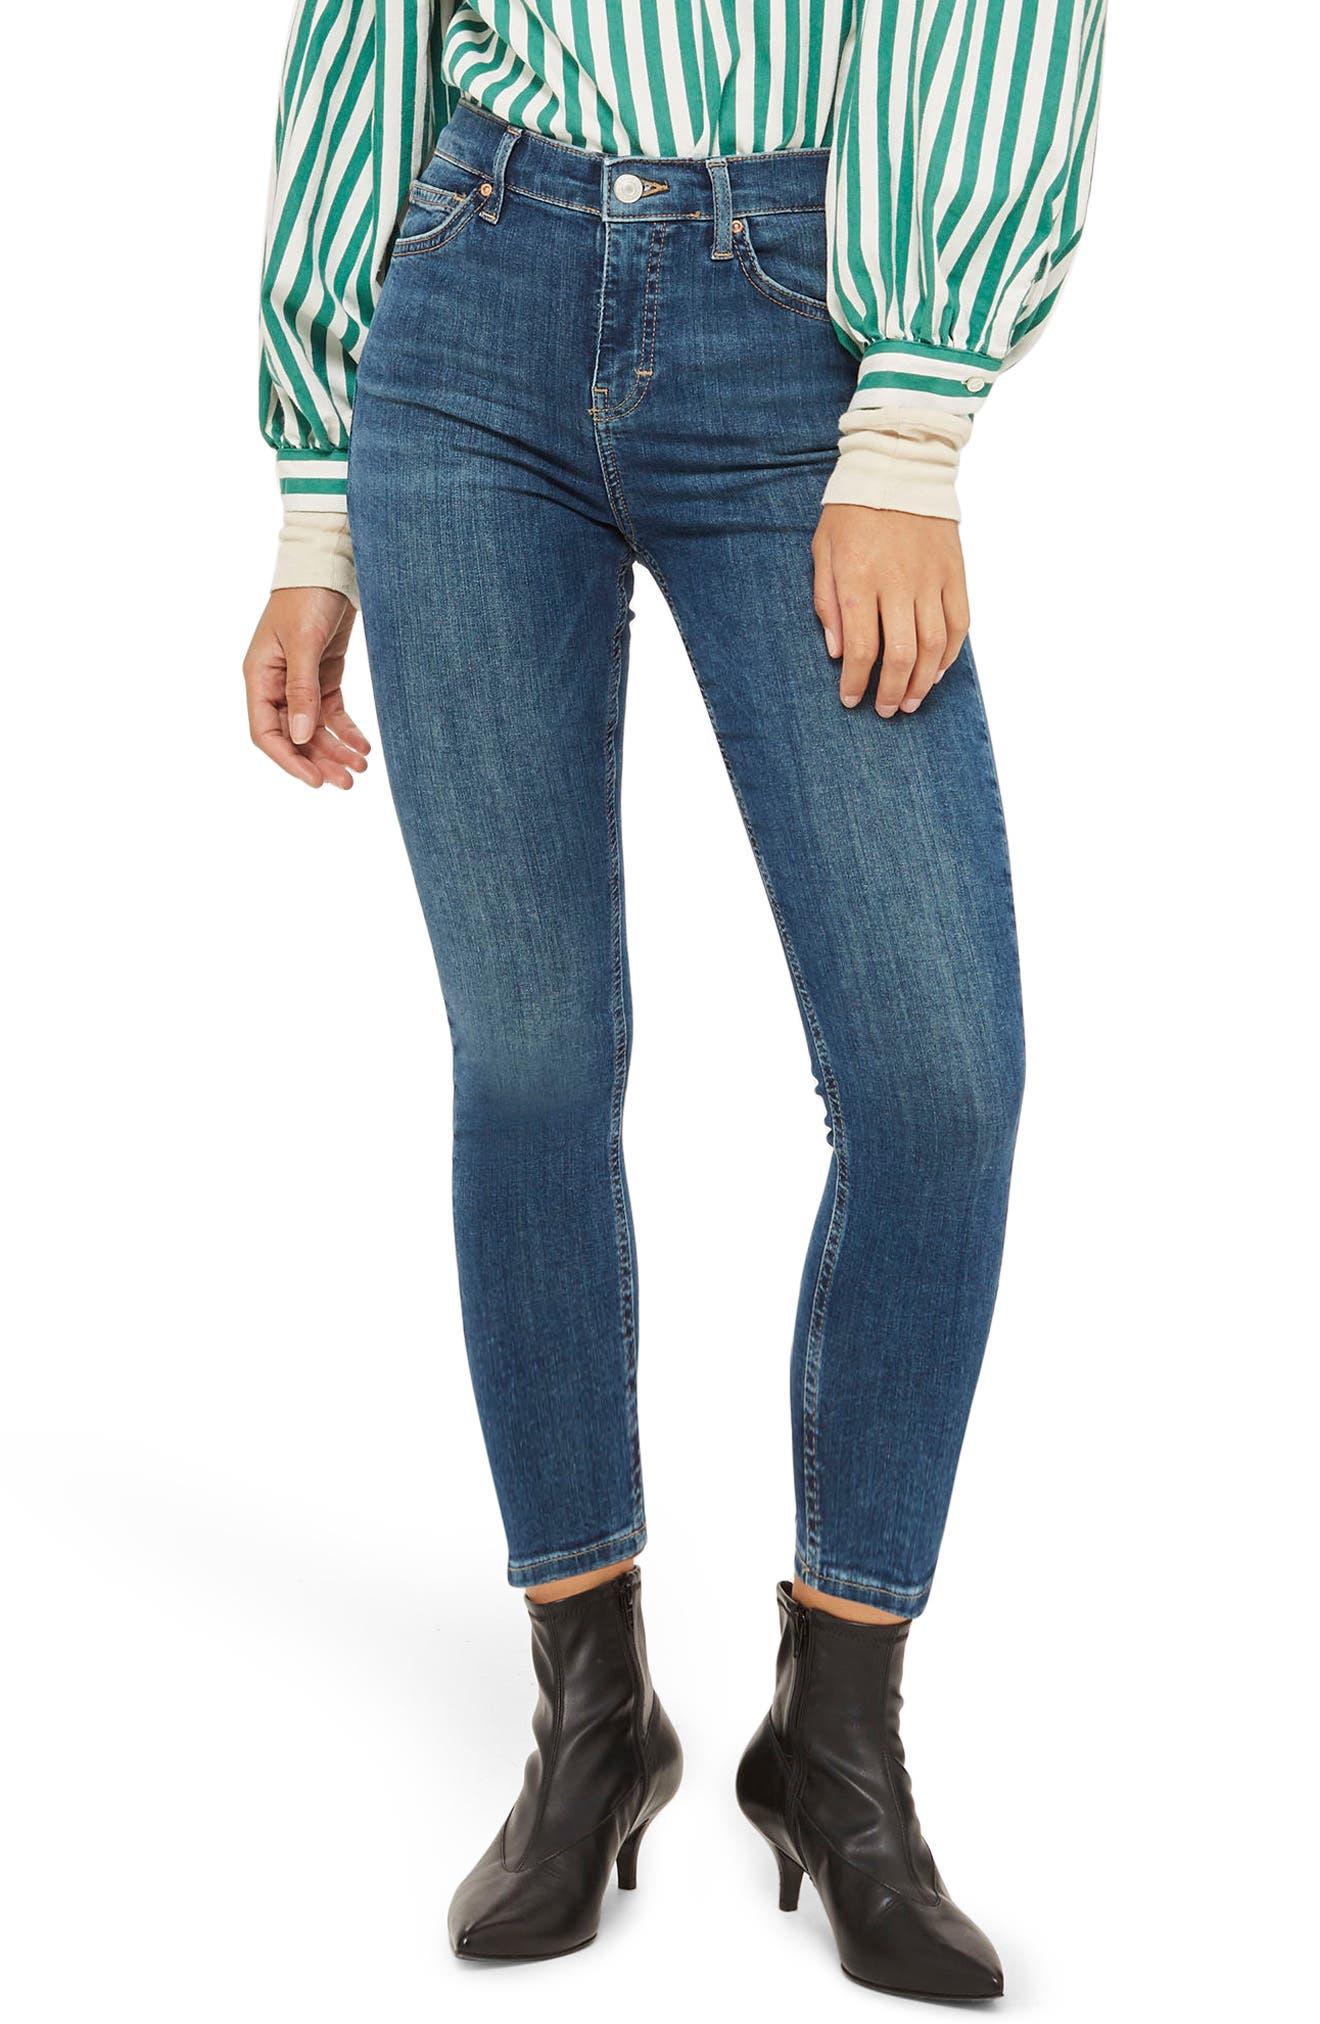 Topshop Jamie Petite Mid Denim Jeans